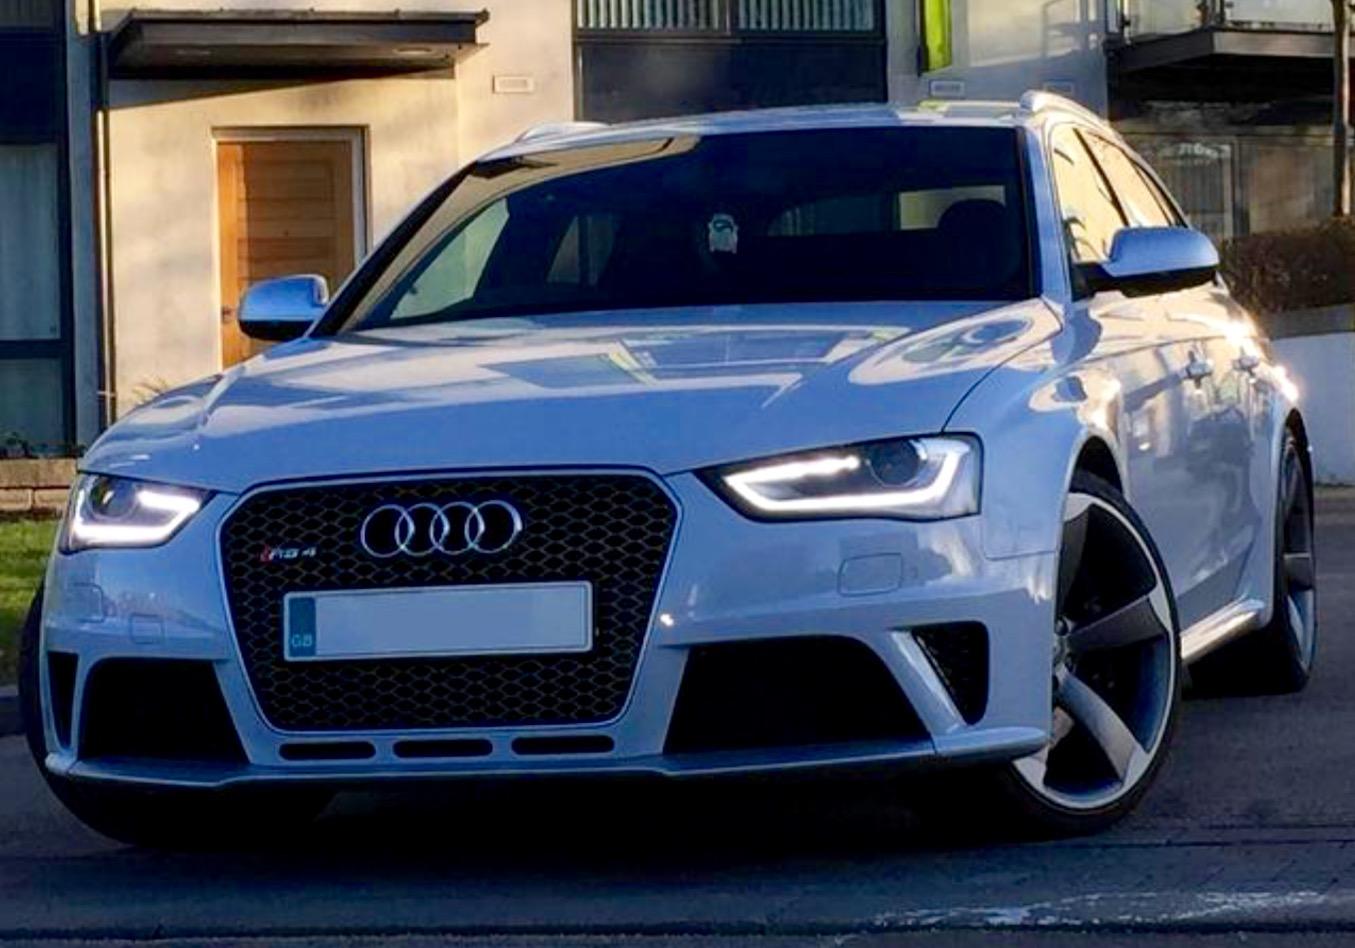 Audi S4/RS4 Conversion - Worth the money? | Audi-Sport net